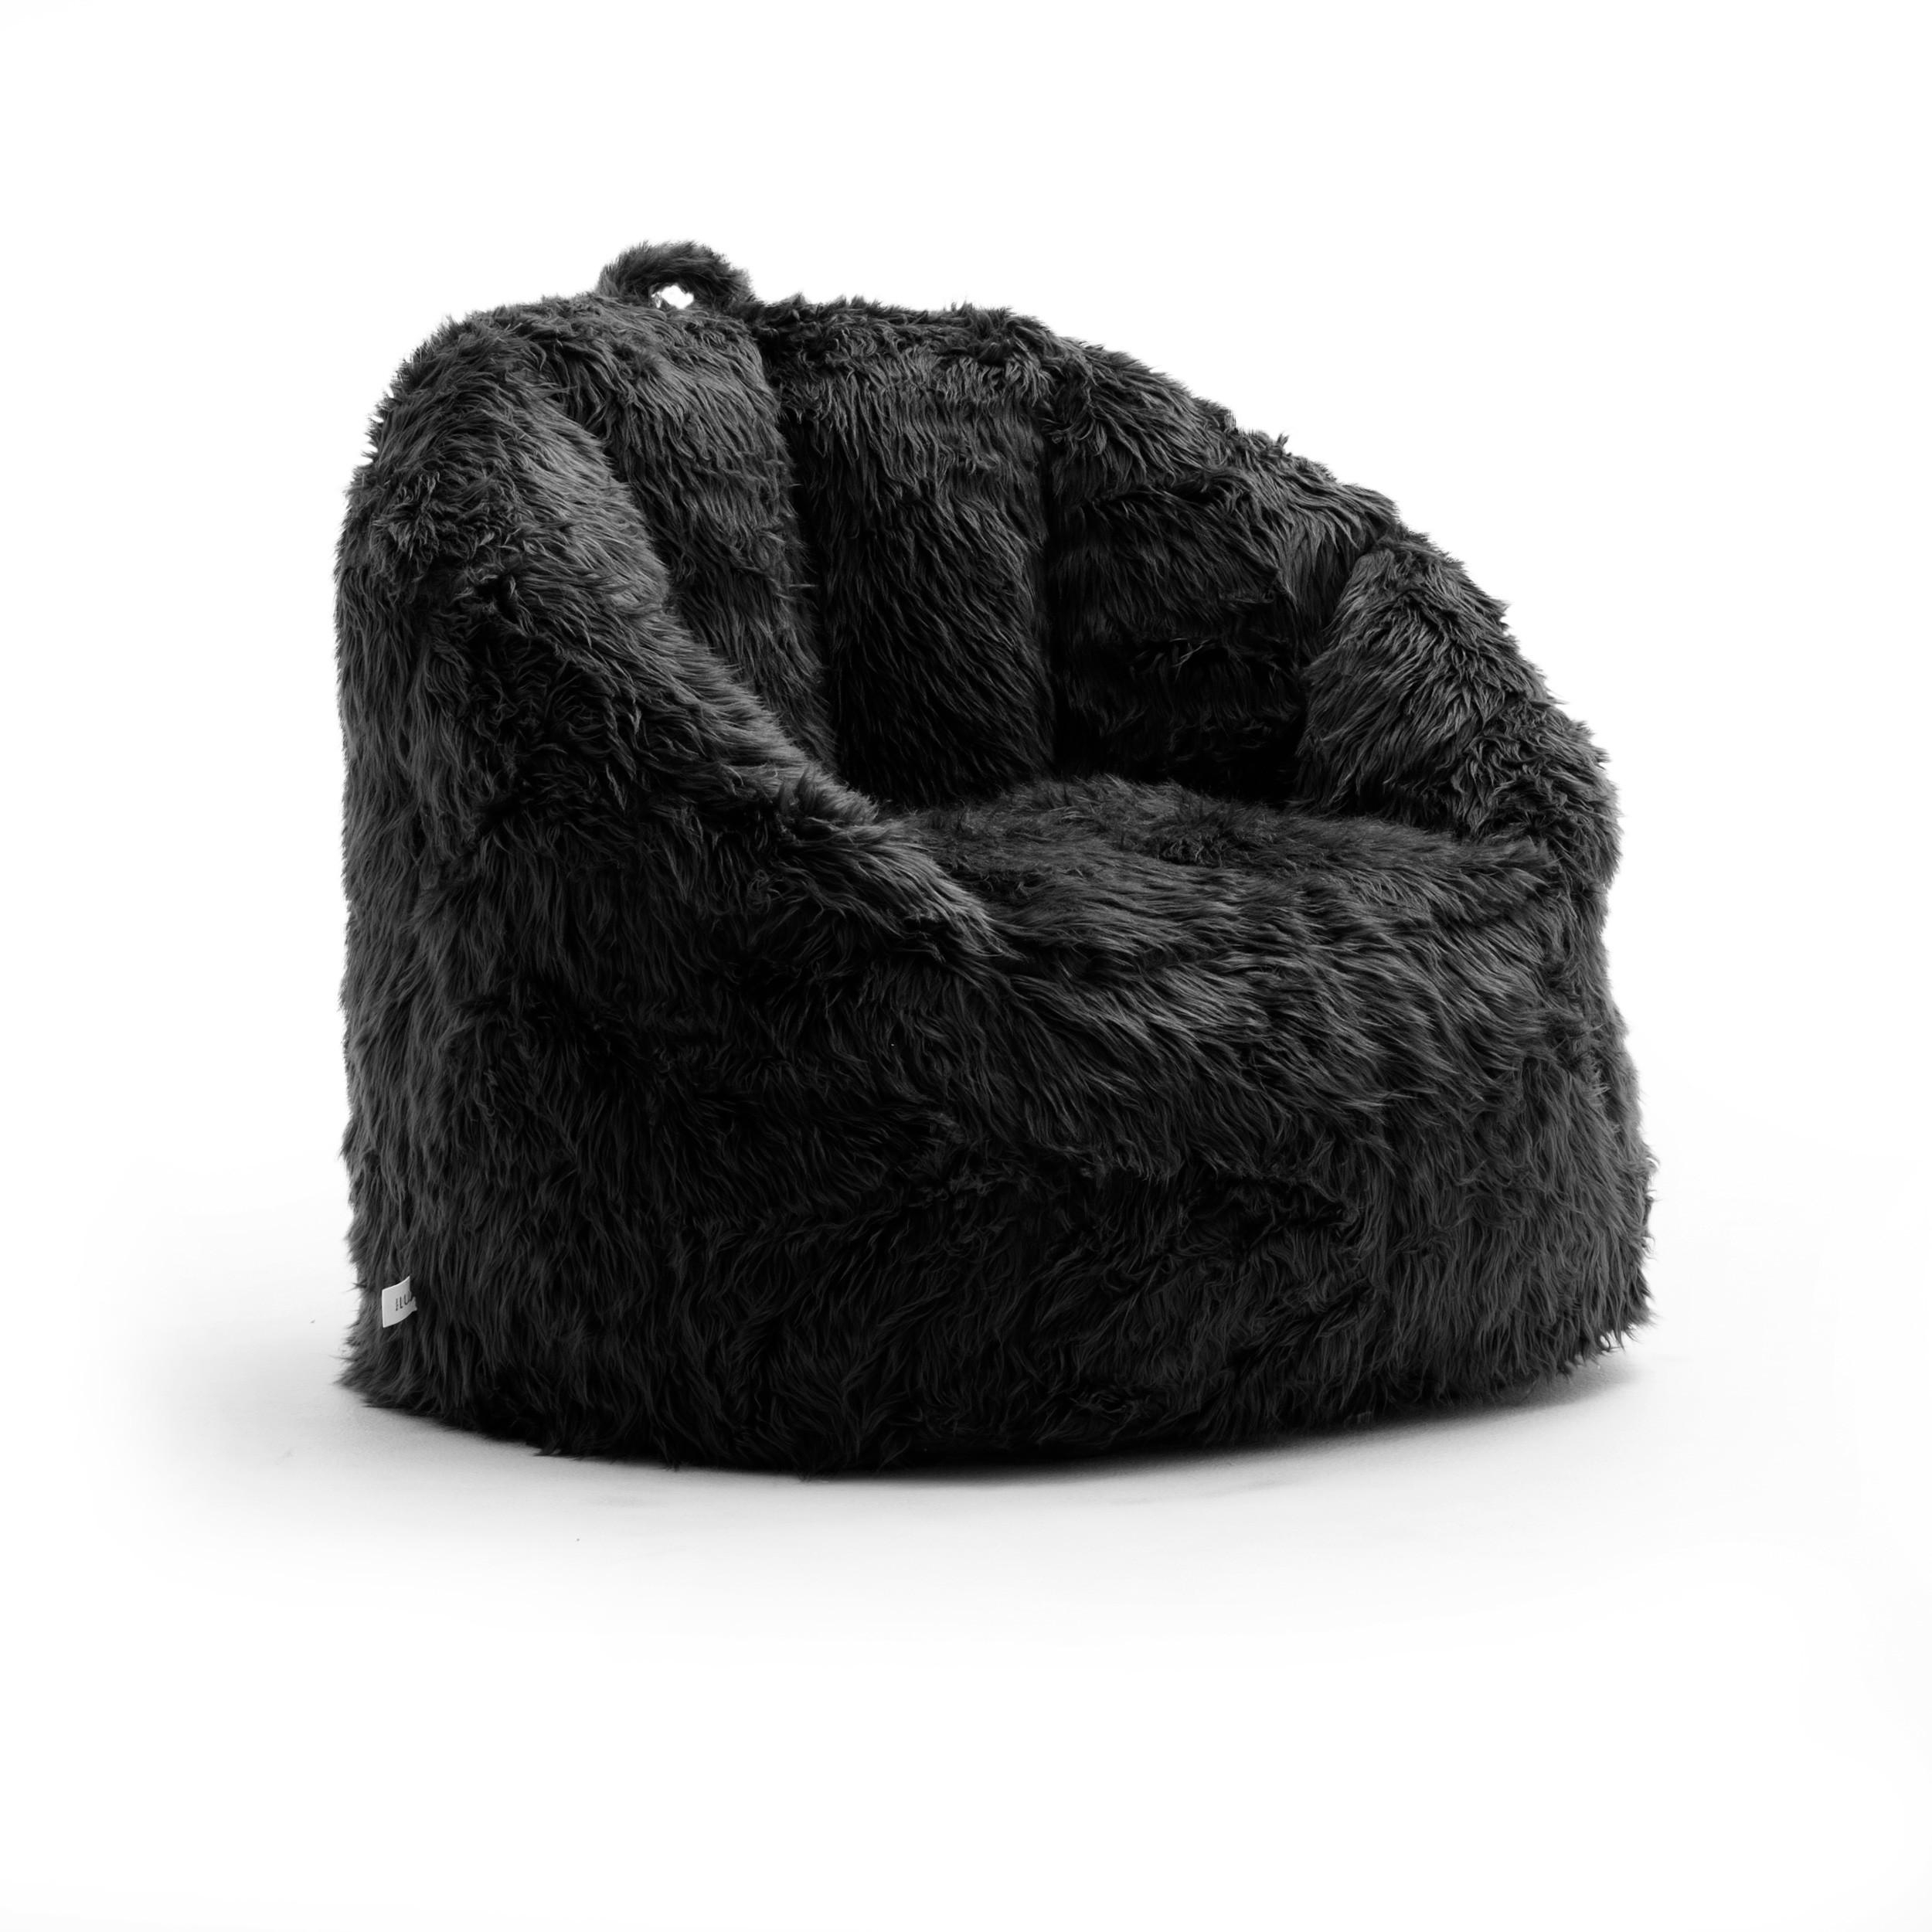 Sectionals Scandinavian Designs Big Joe Modular Sofa ~ Hmmi Intended For Big Joe Modular Sofas (View 9 of 20)